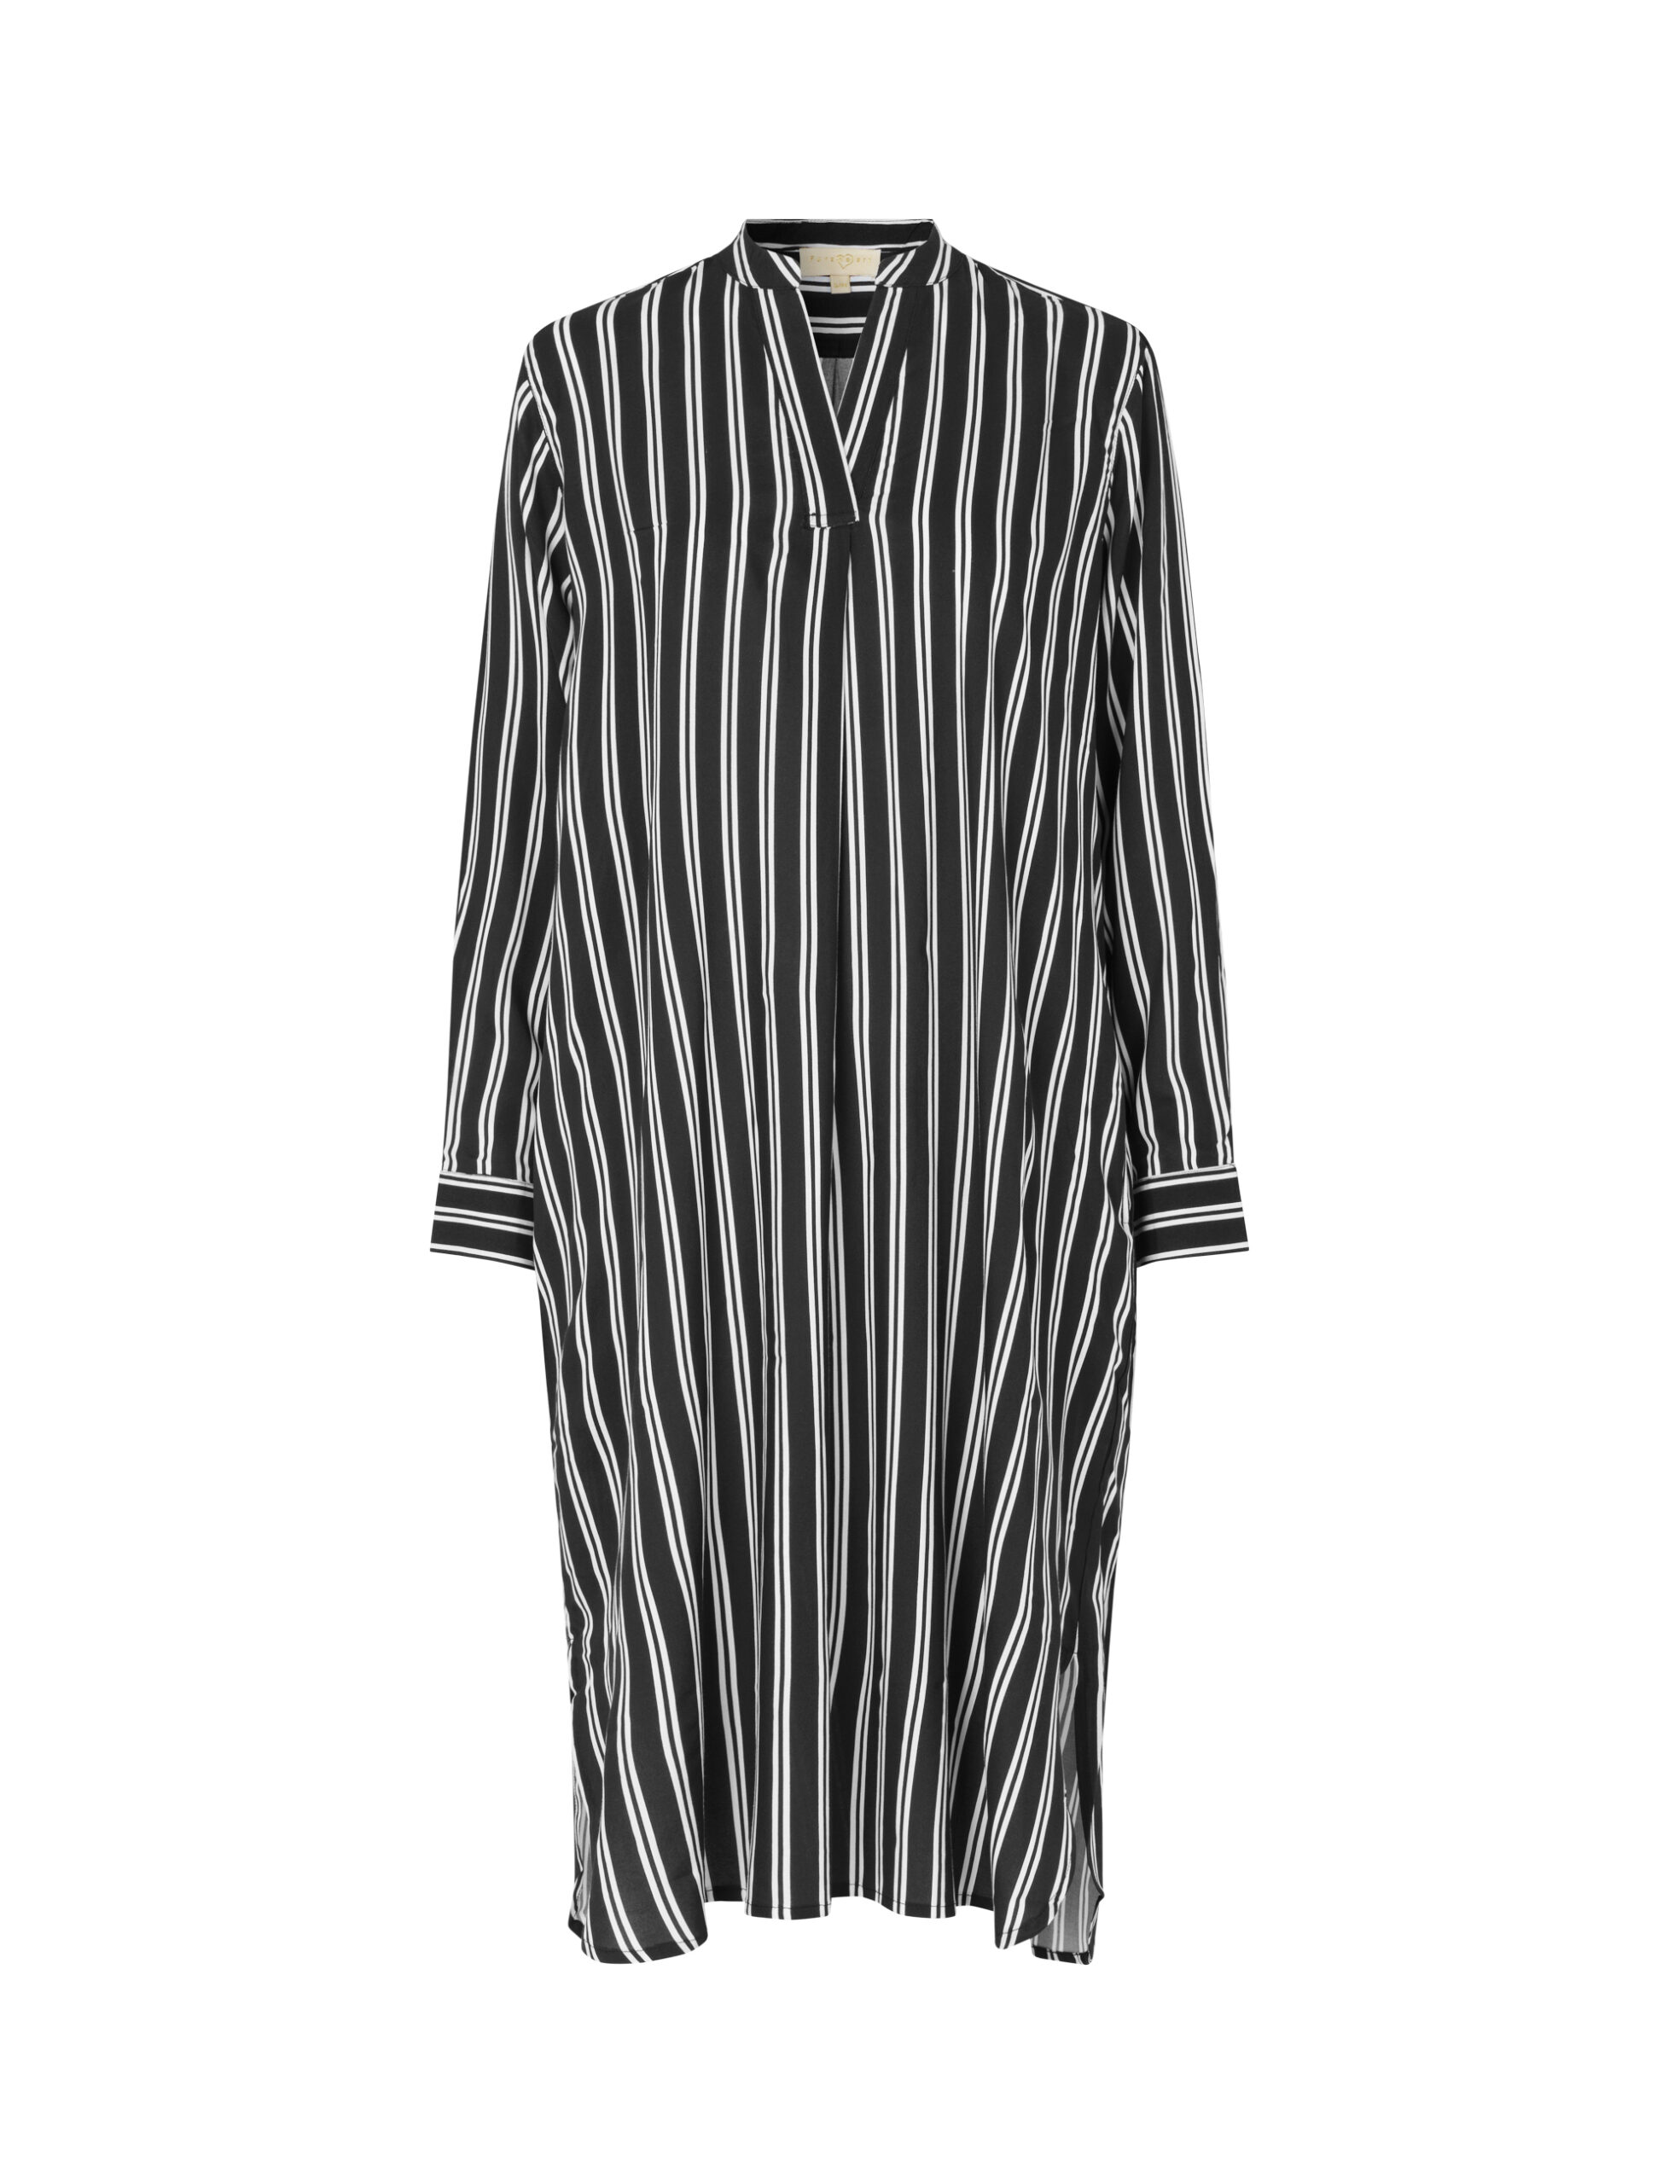 Pureheart short – Black stripe